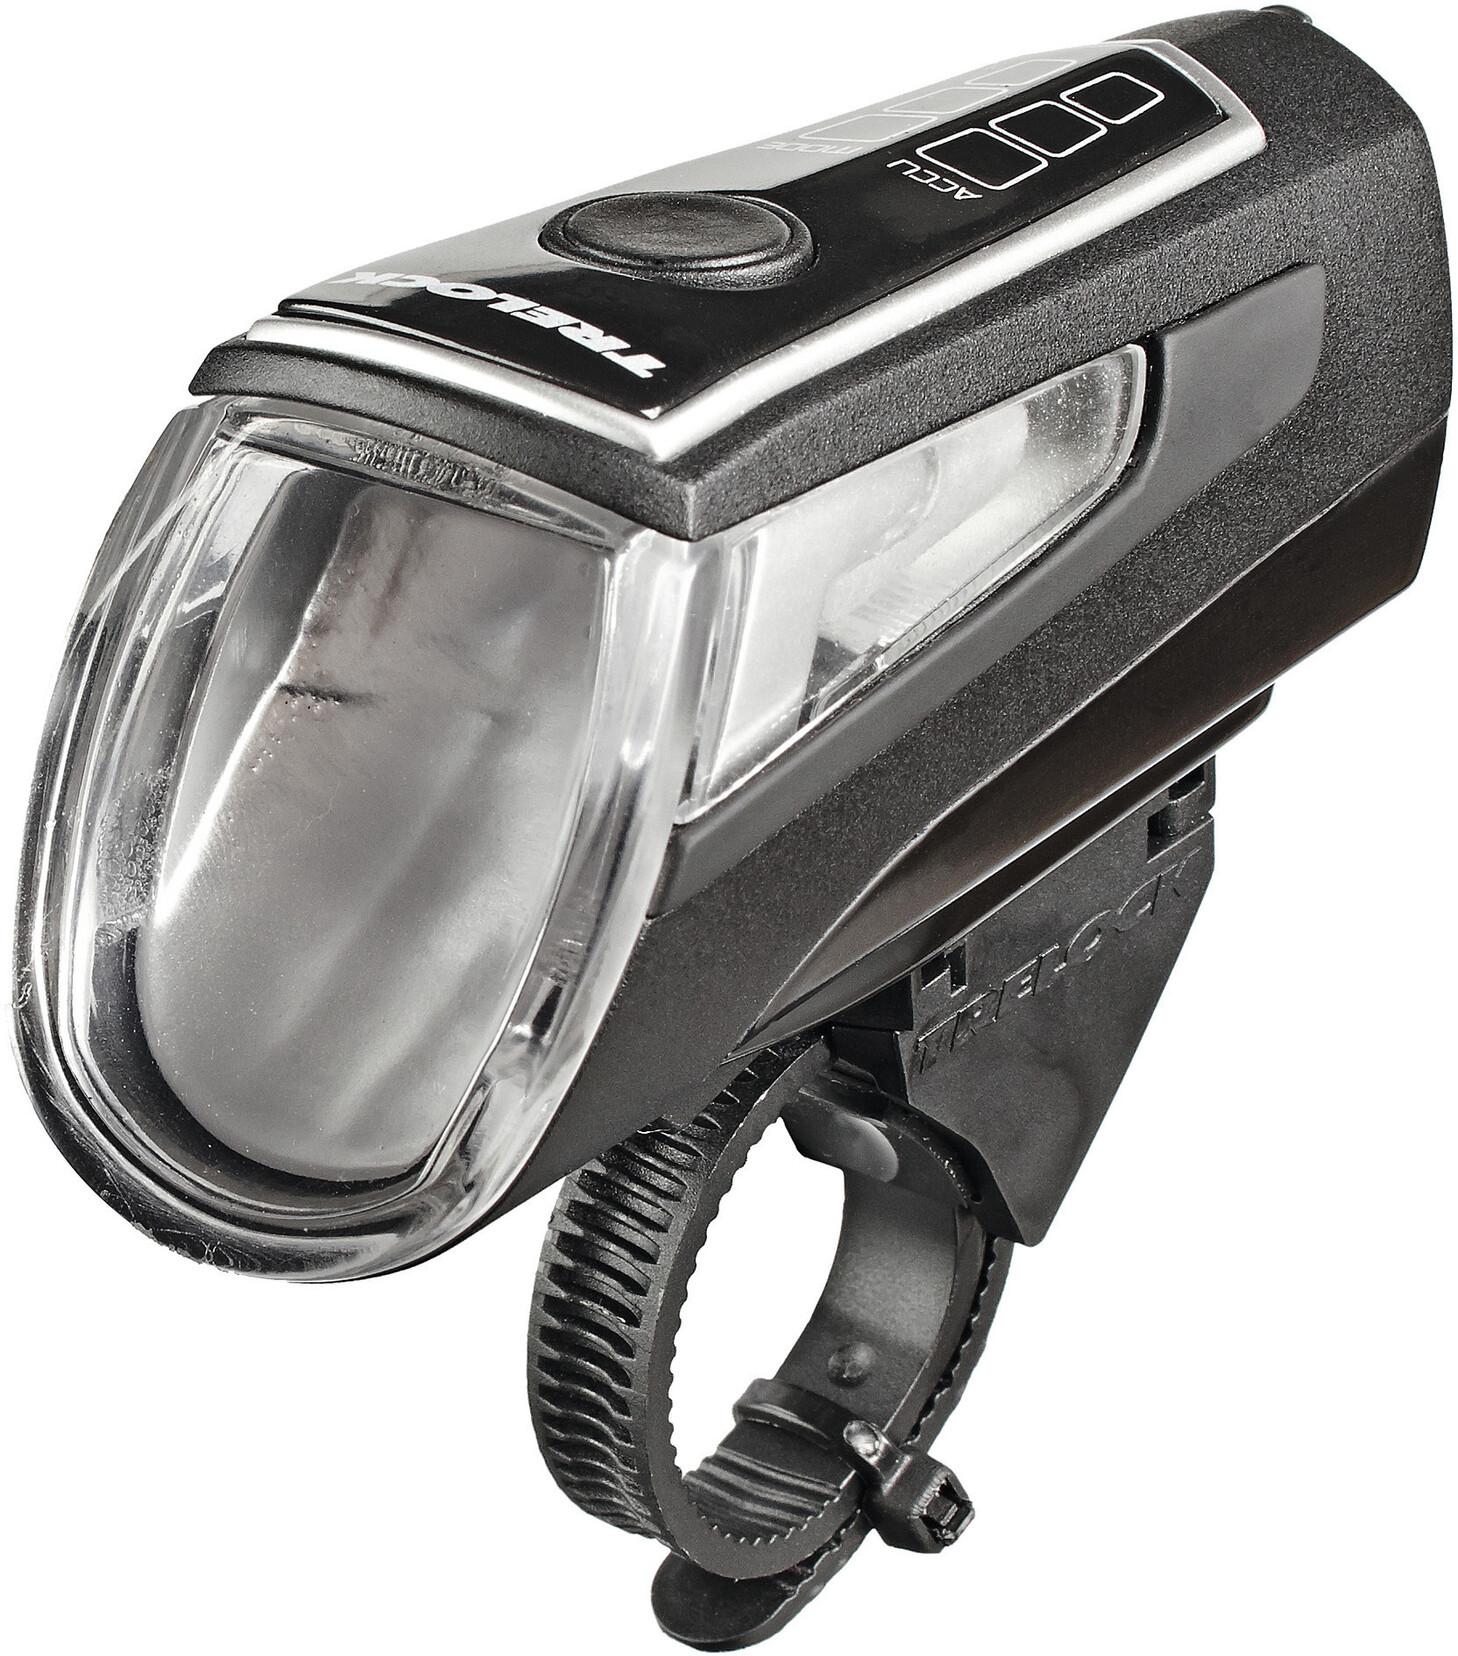 Trelock LS 560 I-GO Control Cykellygter, black (2019) | Light Set